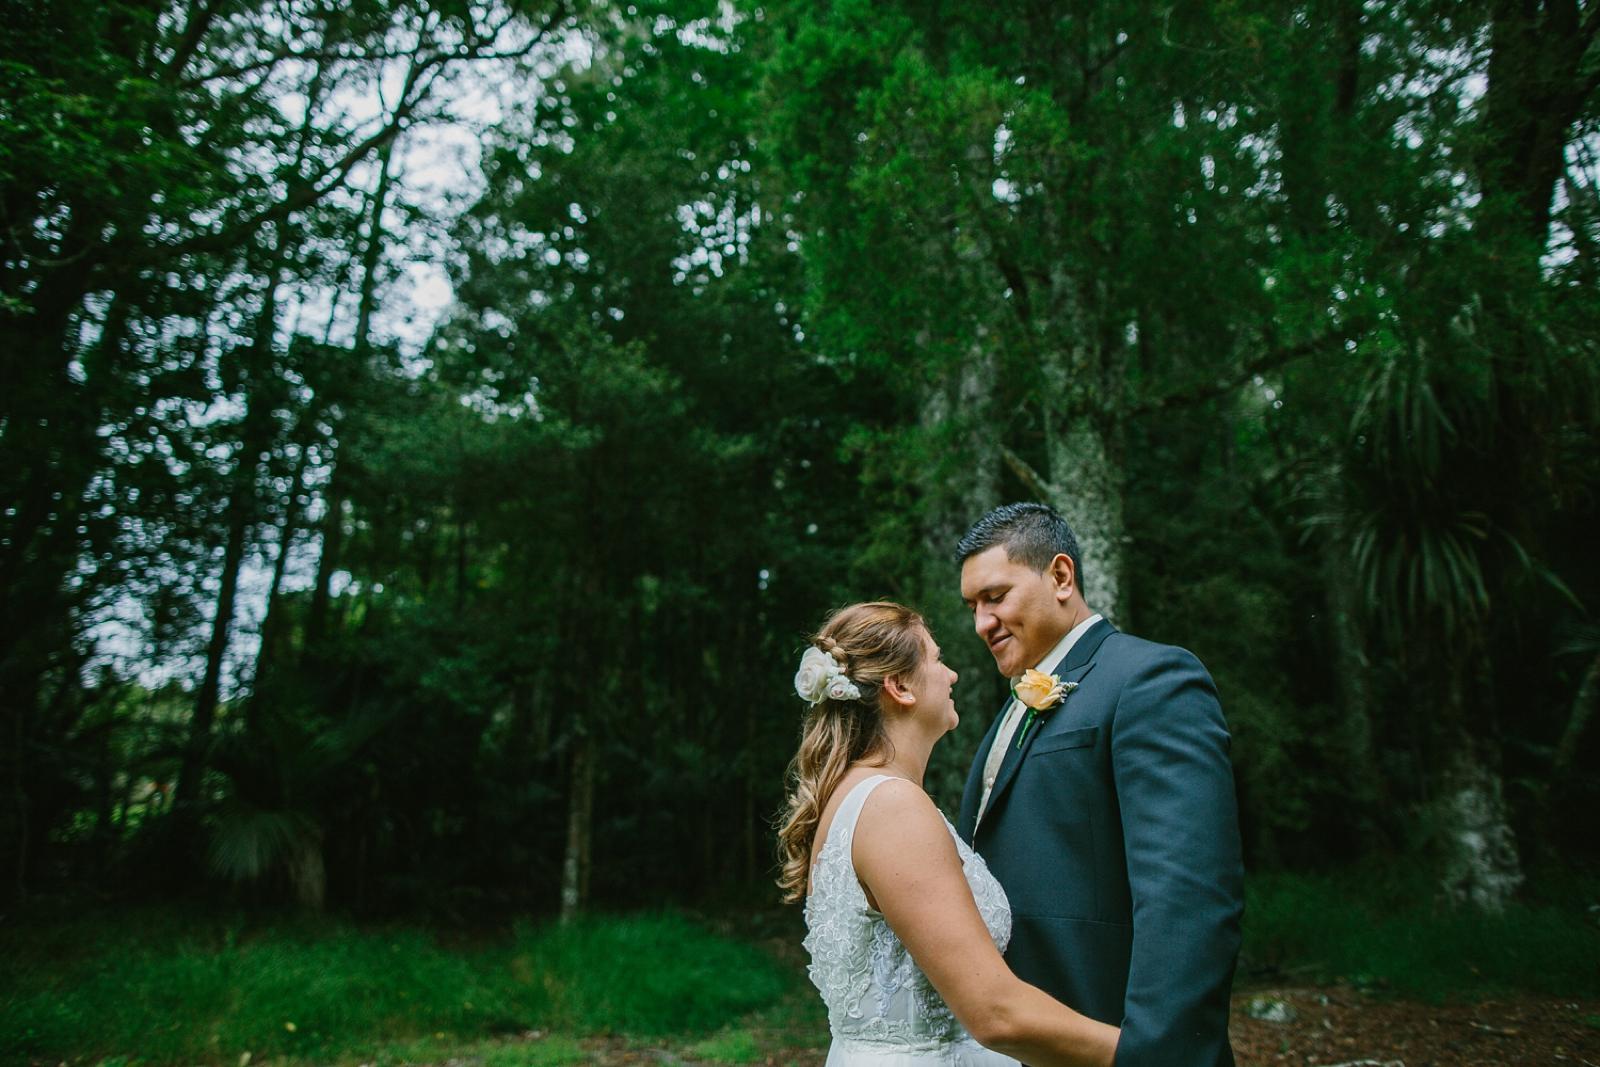 GabbyFiti_Auckland Wedding Photographer_Patty Lagera_0083.jpg